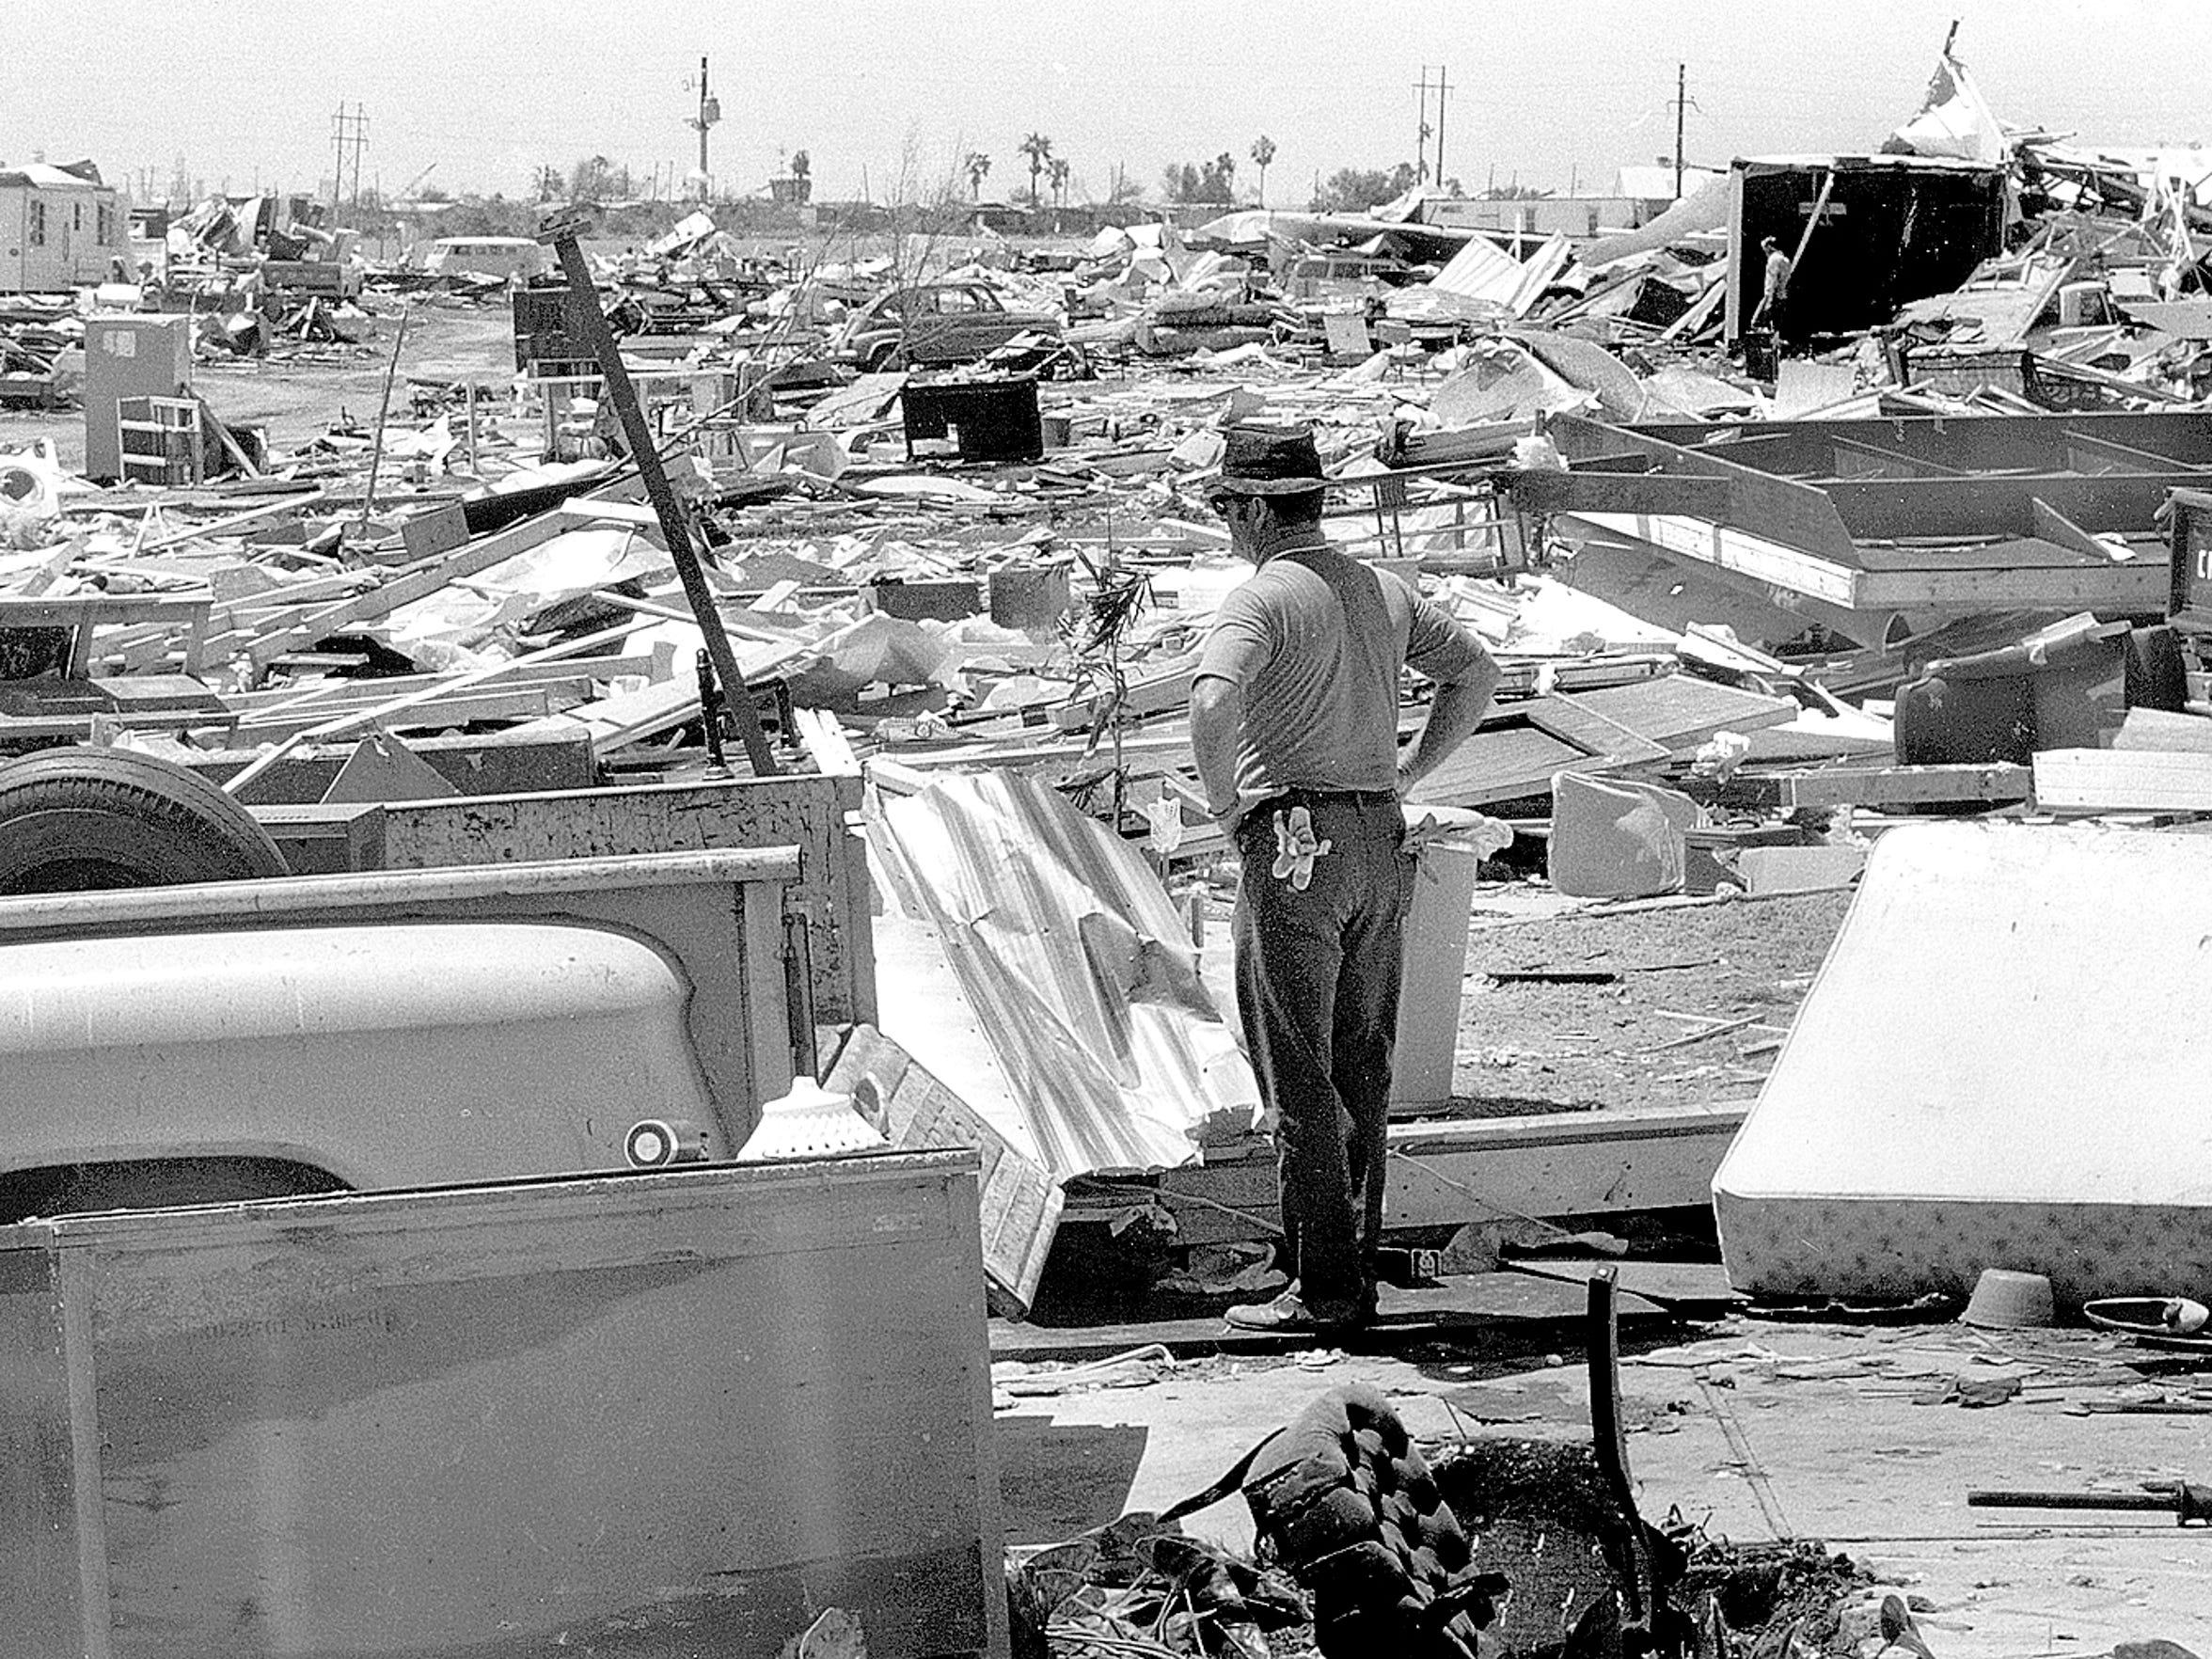 In this 1970 file photo, a man surveys the damage after Hurricane Celia struck Corpus Christi.